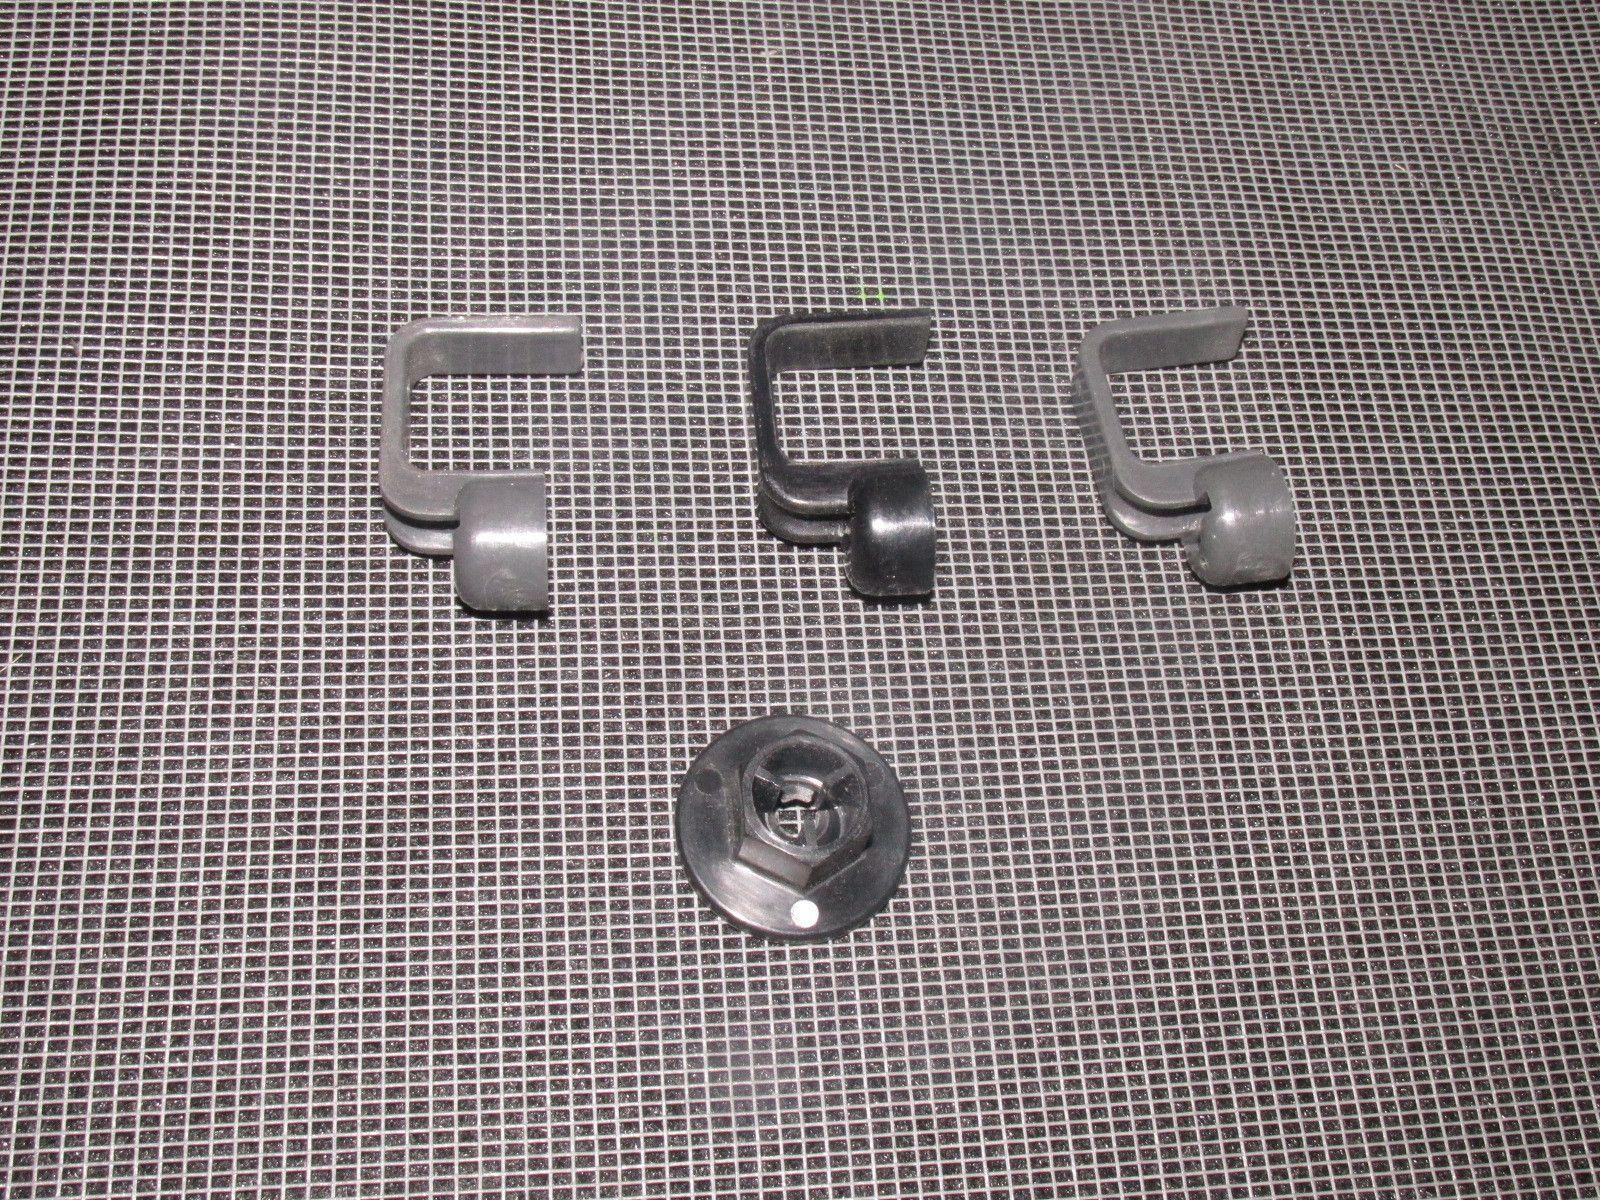 94 95 96 97 Mazda Miata Oem Tail Light Wiring Harness Holder Clips